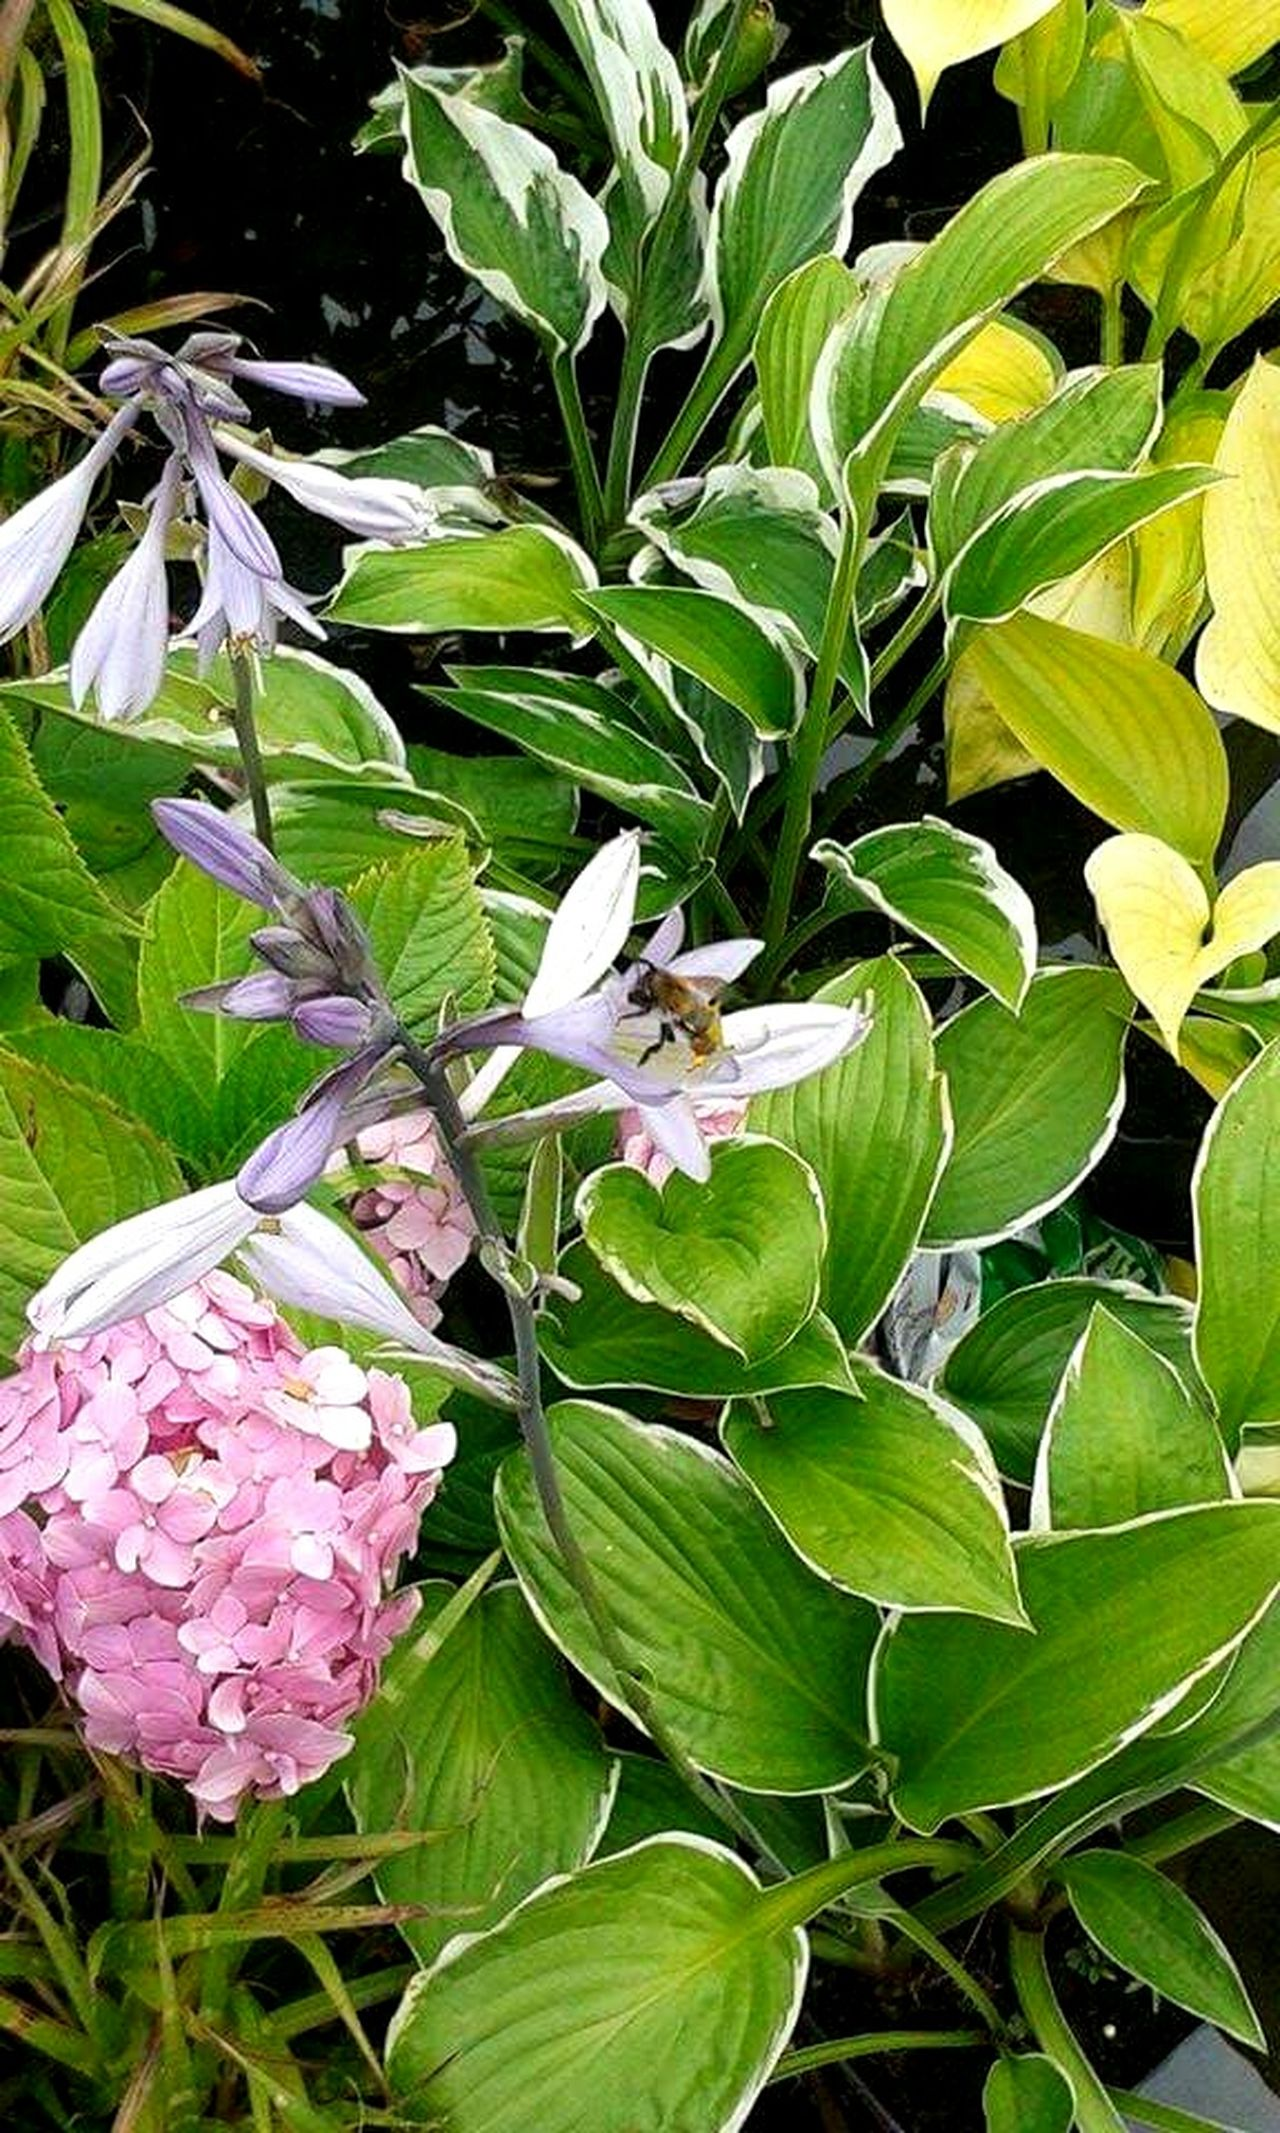 Pszczołą Flower Kwiaty Flowers Kwiat Plant Plants Garden Bee Bee 🐝 Plants 🌱